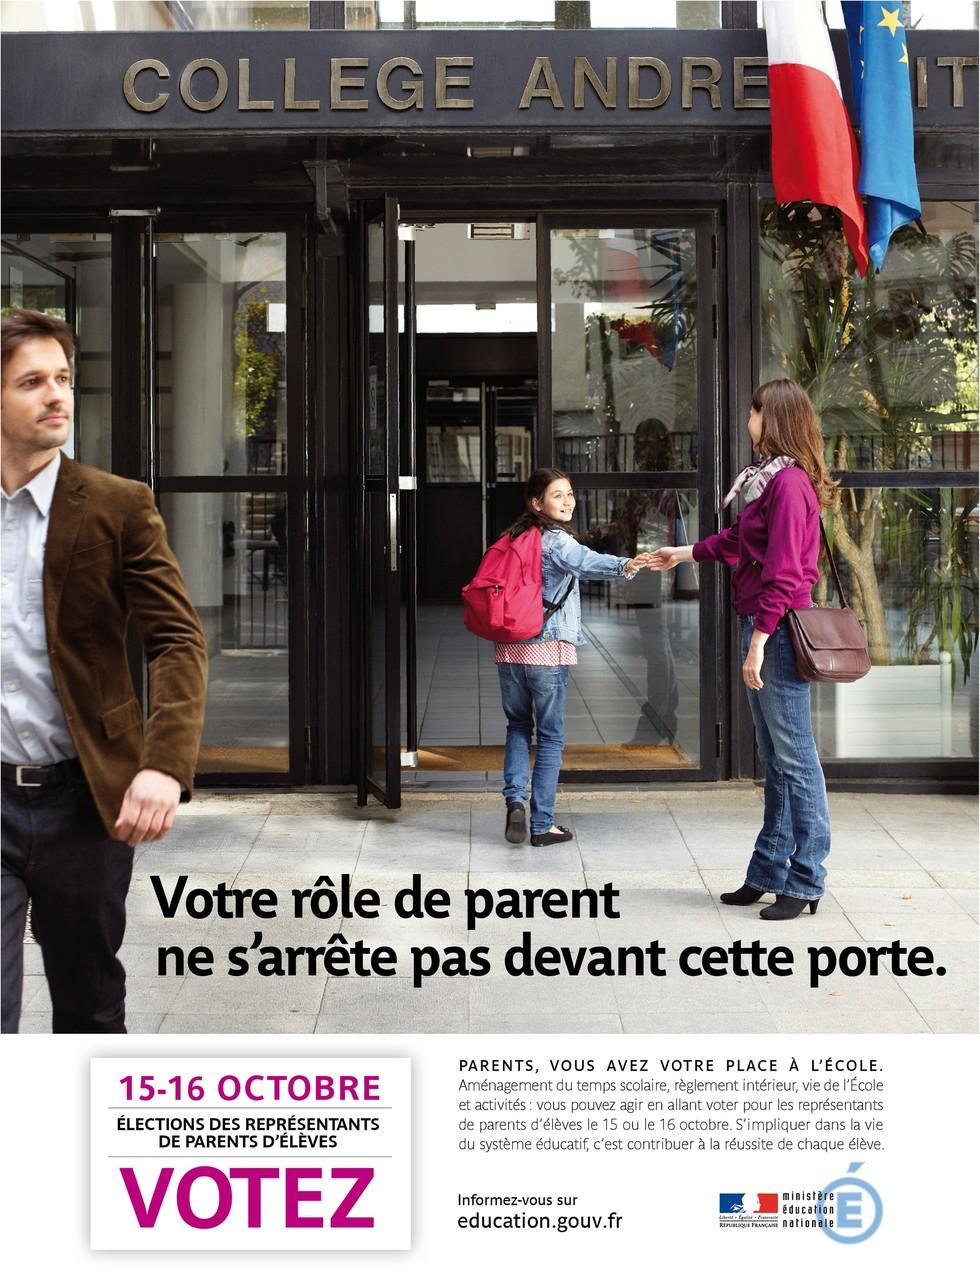 http://media.education.gouv.fr/image/10_octobre/01/6/MEN_campagne_elections_157016.54.JPG